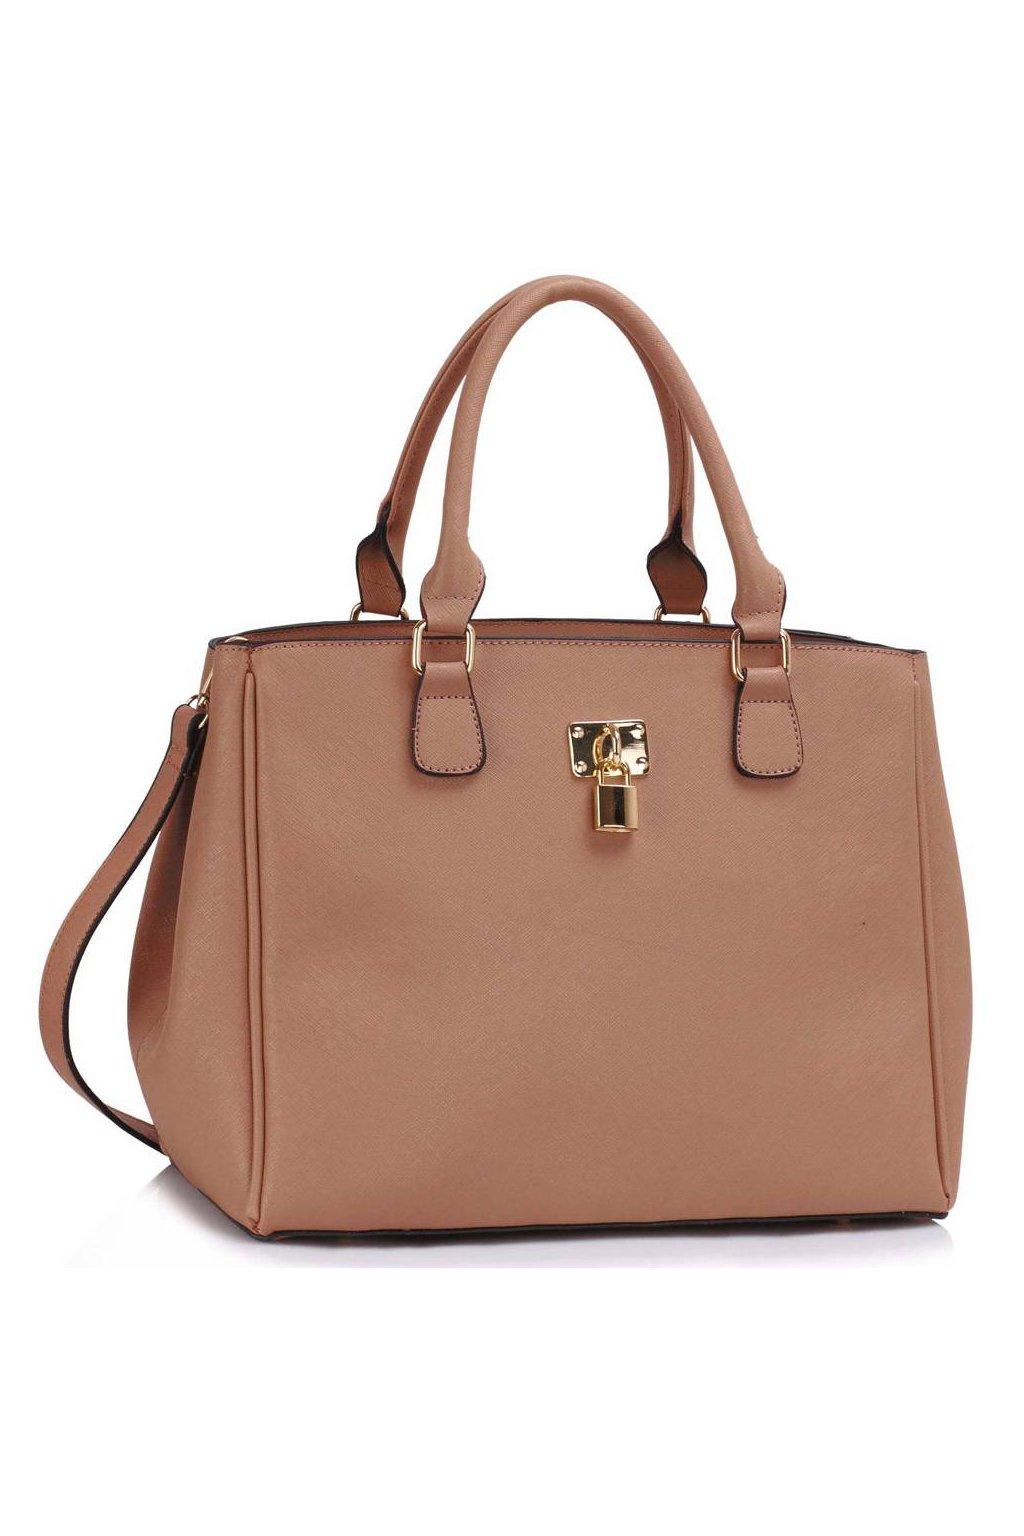 Trendová kabelka do ruky Janis telová LS00410